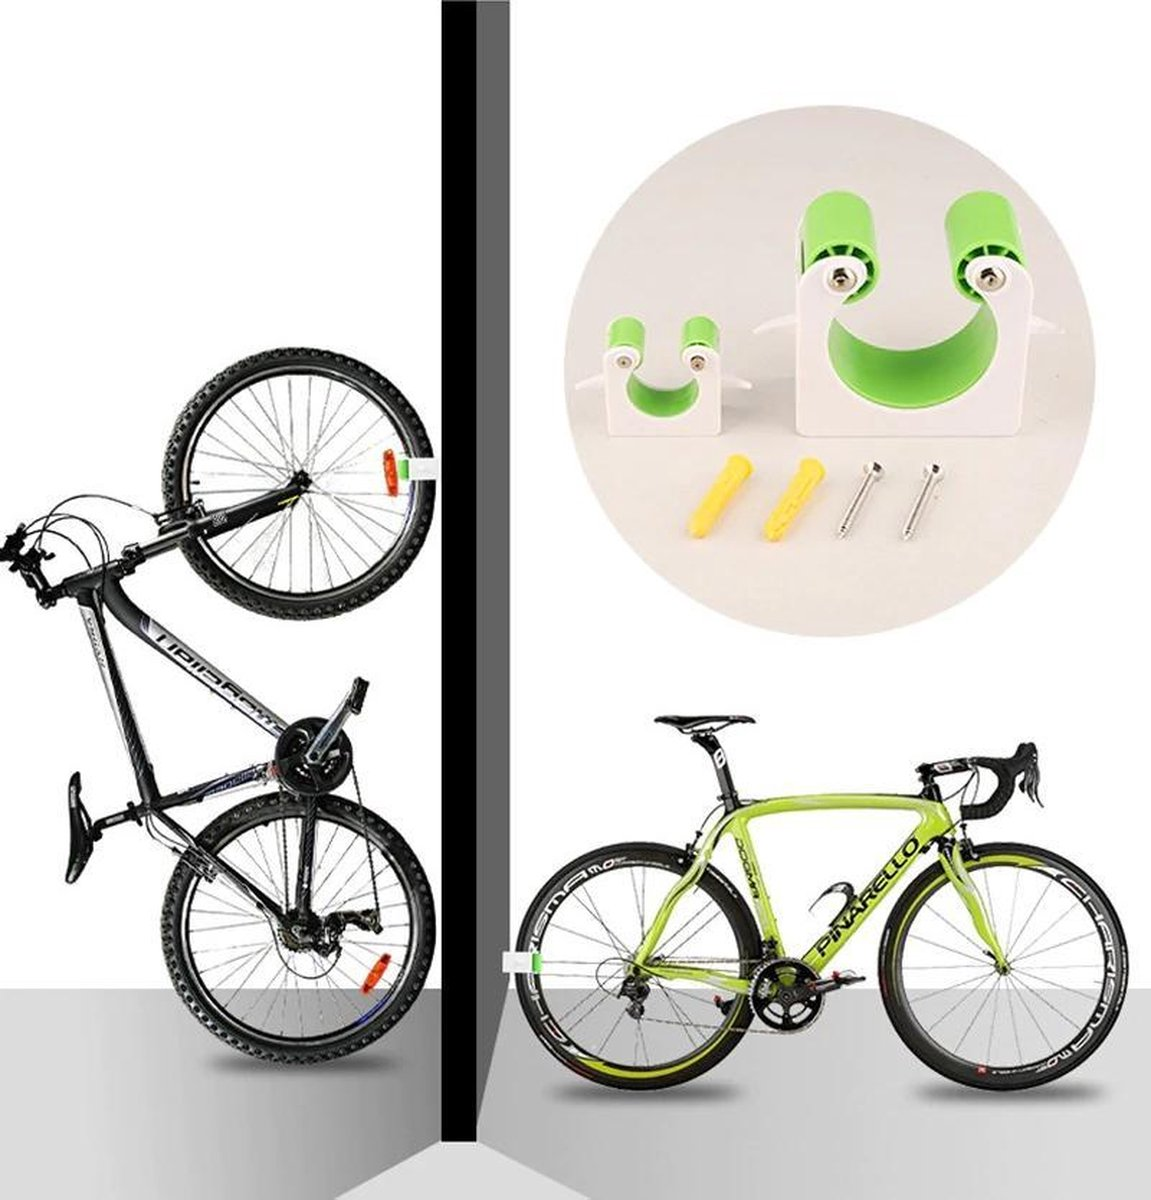 Racefiets Bike Fiets Parking Road Gesp Muurbevestiging Haak Stand Verticale Opslag